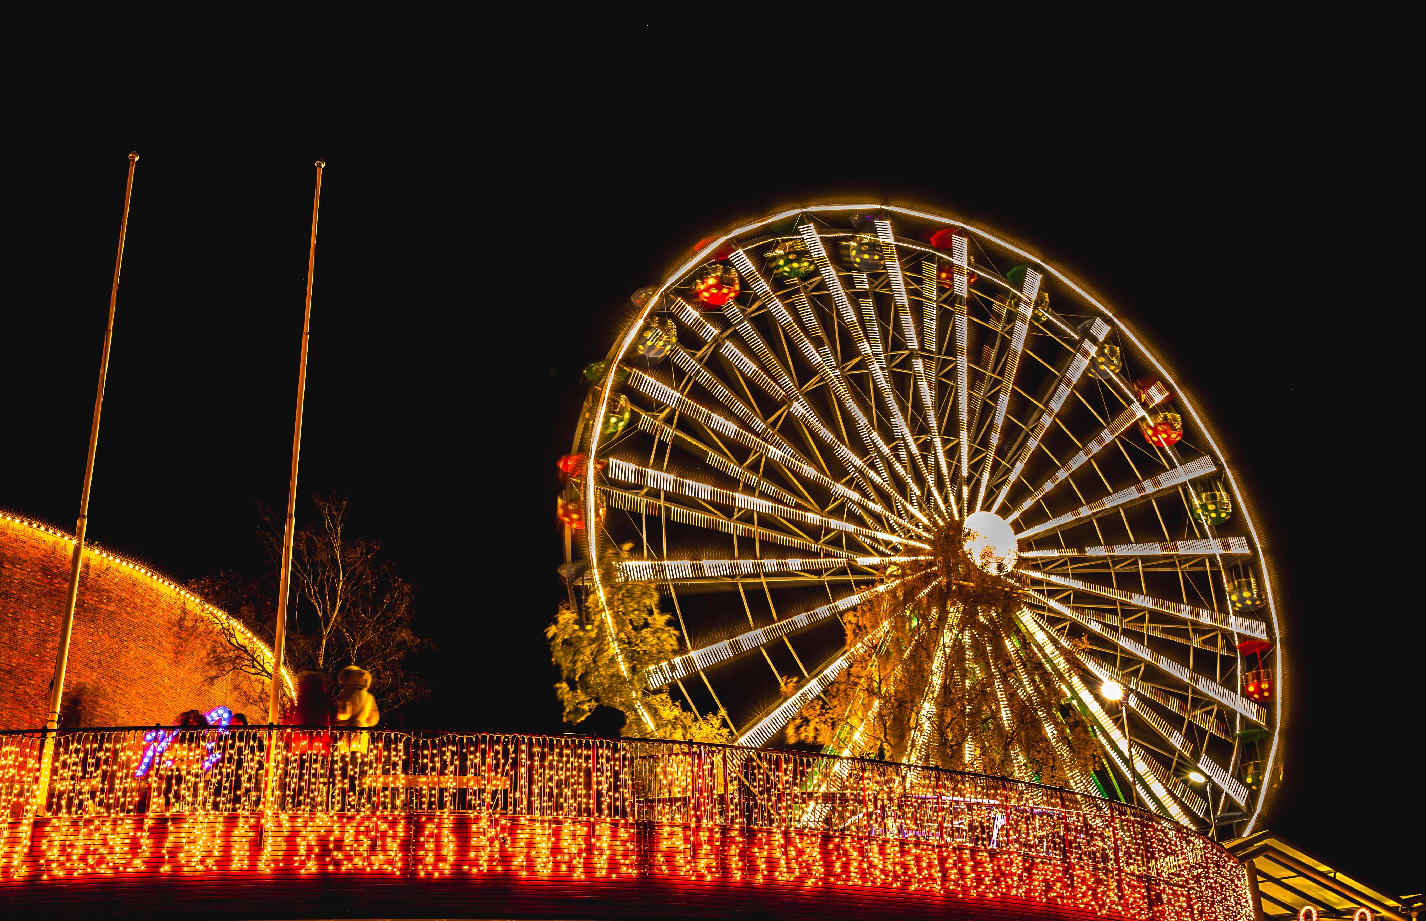 Linanmaki amusement park Helsinki